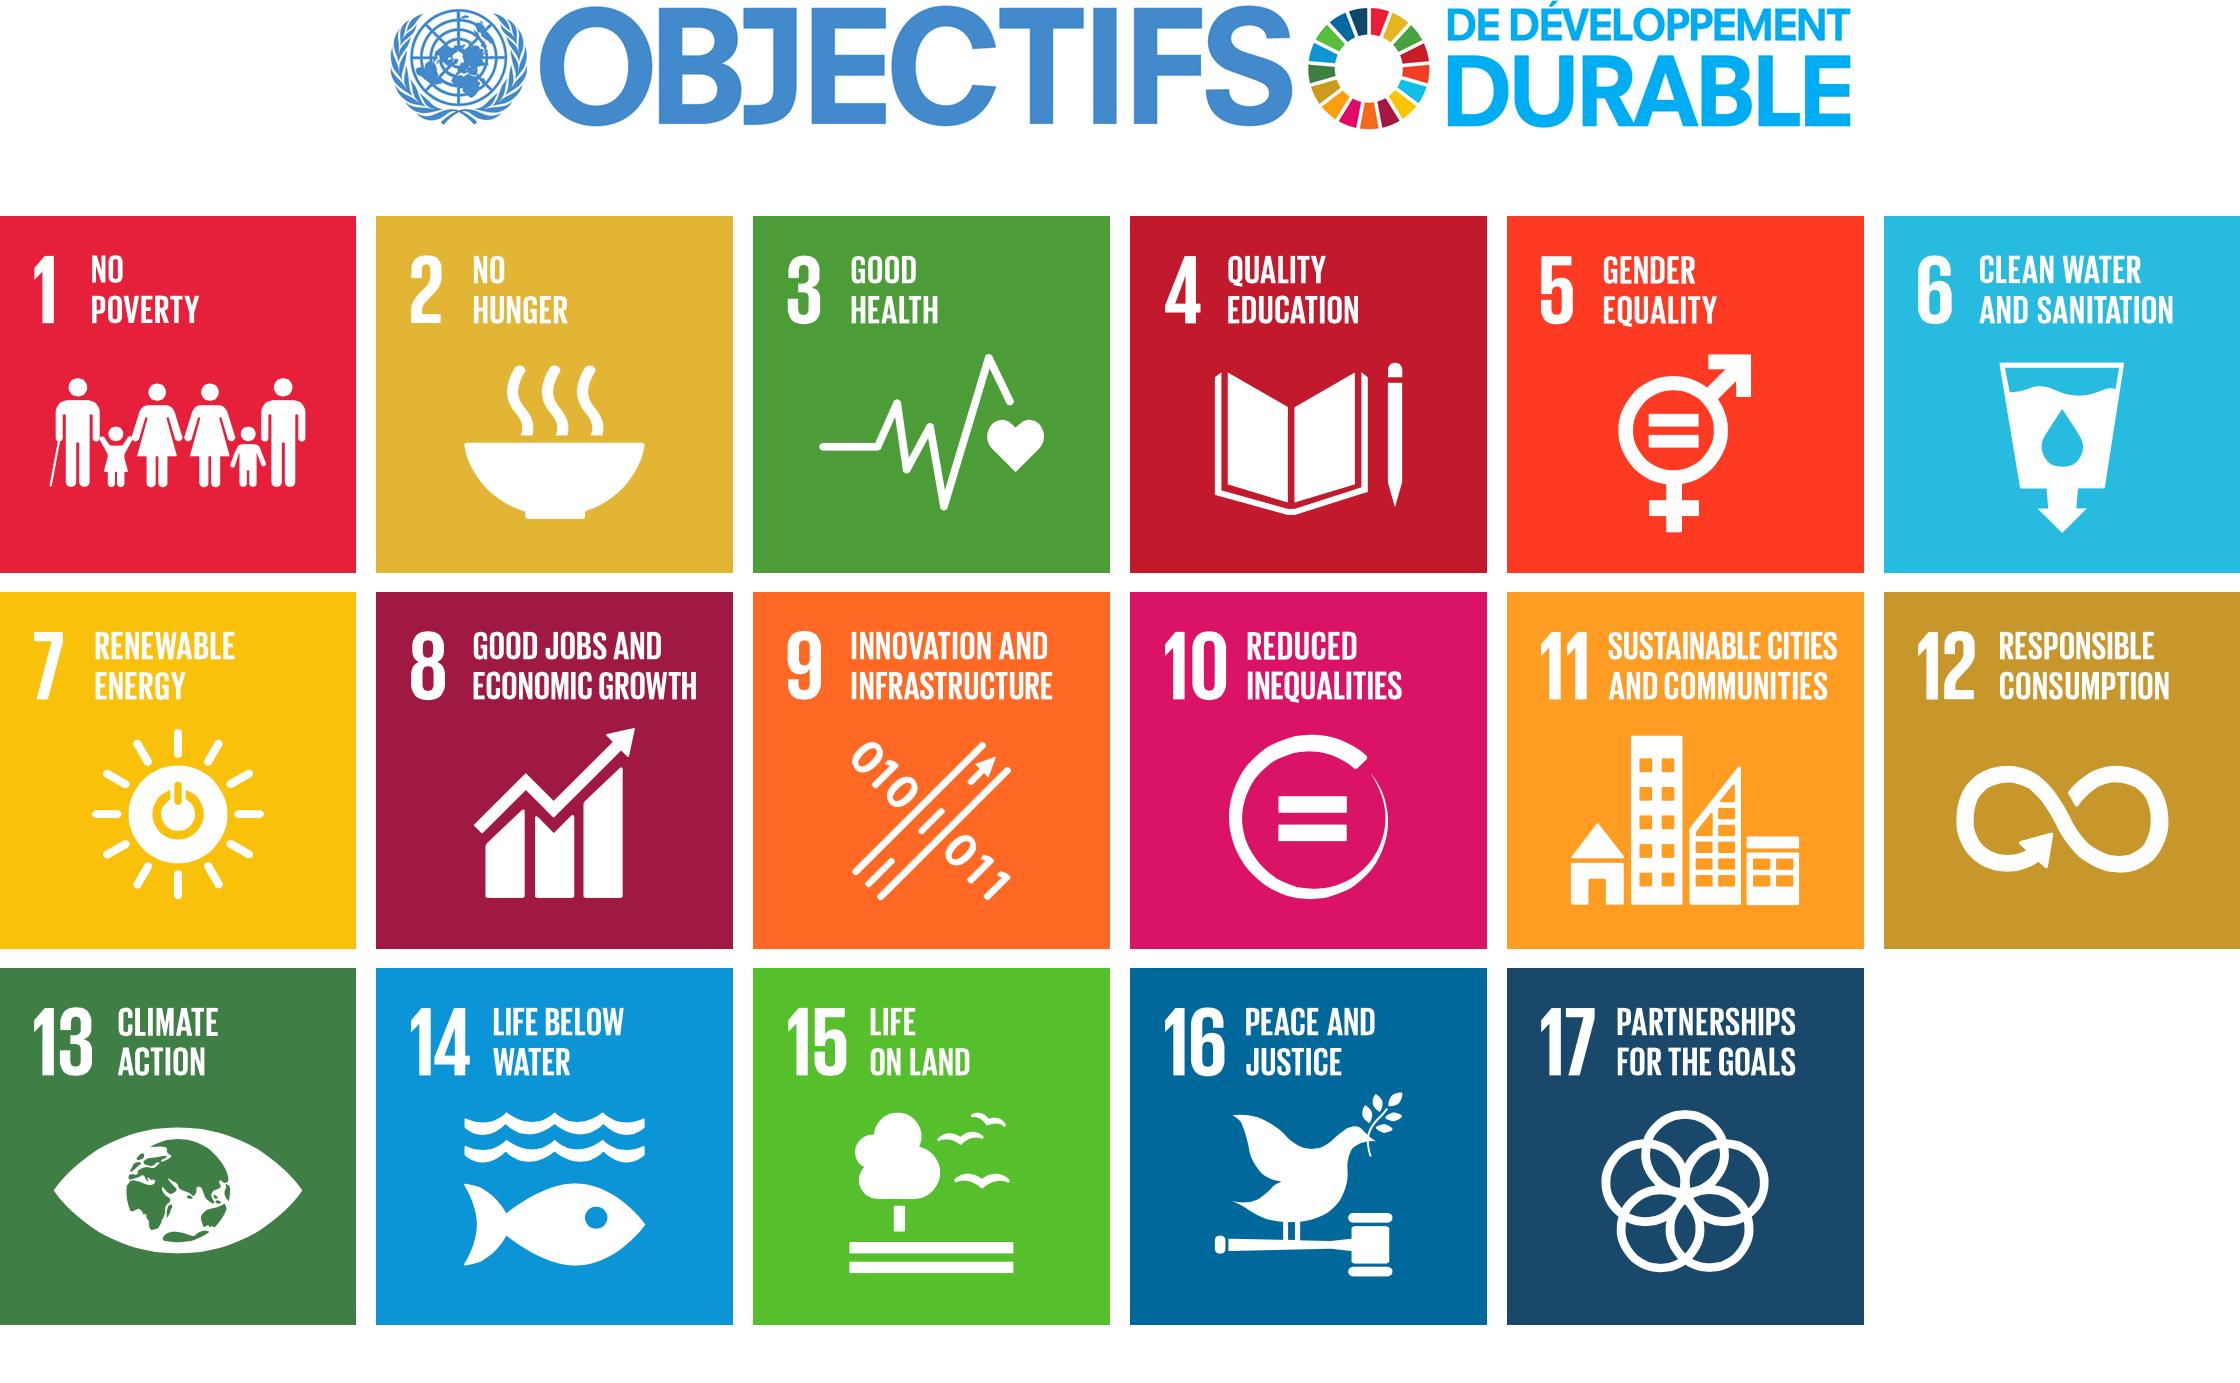 objectif-dev-durables-2016